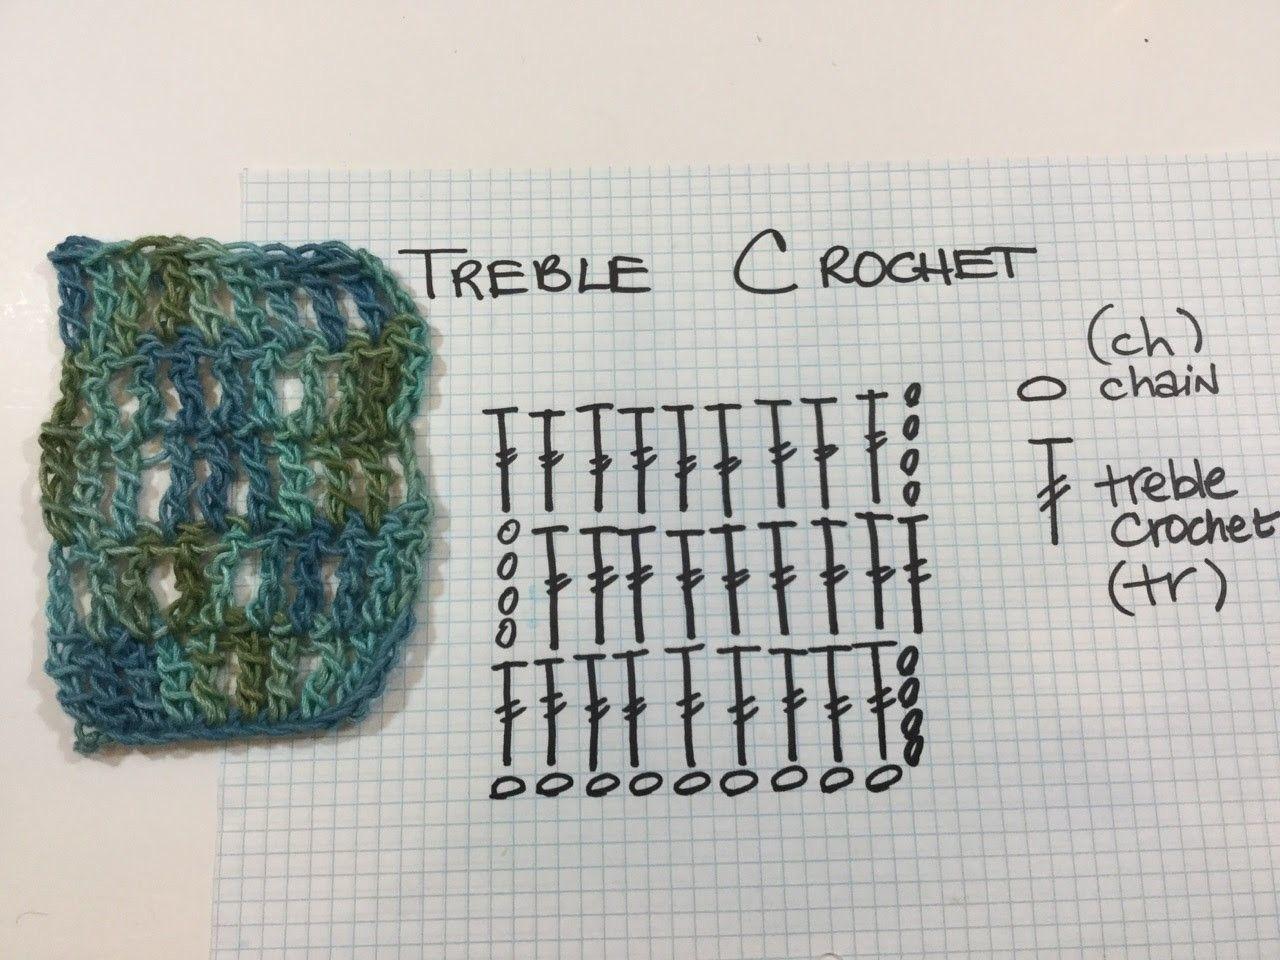 How to read crochet charts treble crochet crochet chart chart how to read crochet charts treble crochet dt1010fo